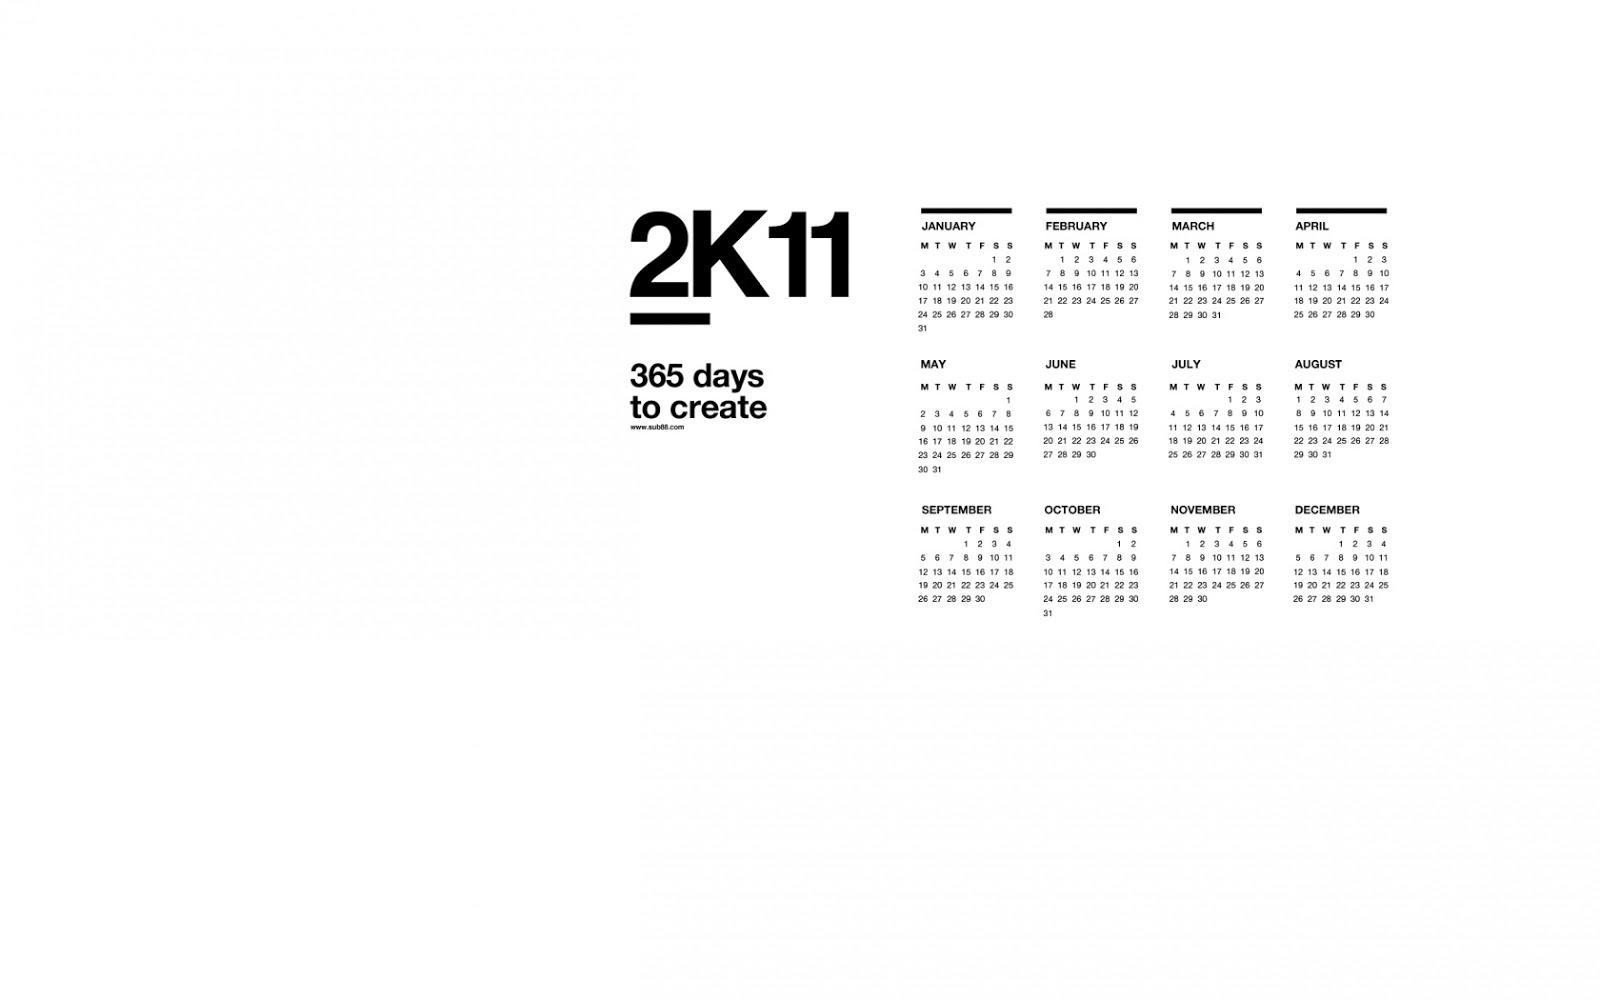 11 X 17 Calendar Templates/page/2 | Search Results | Calendar 2015